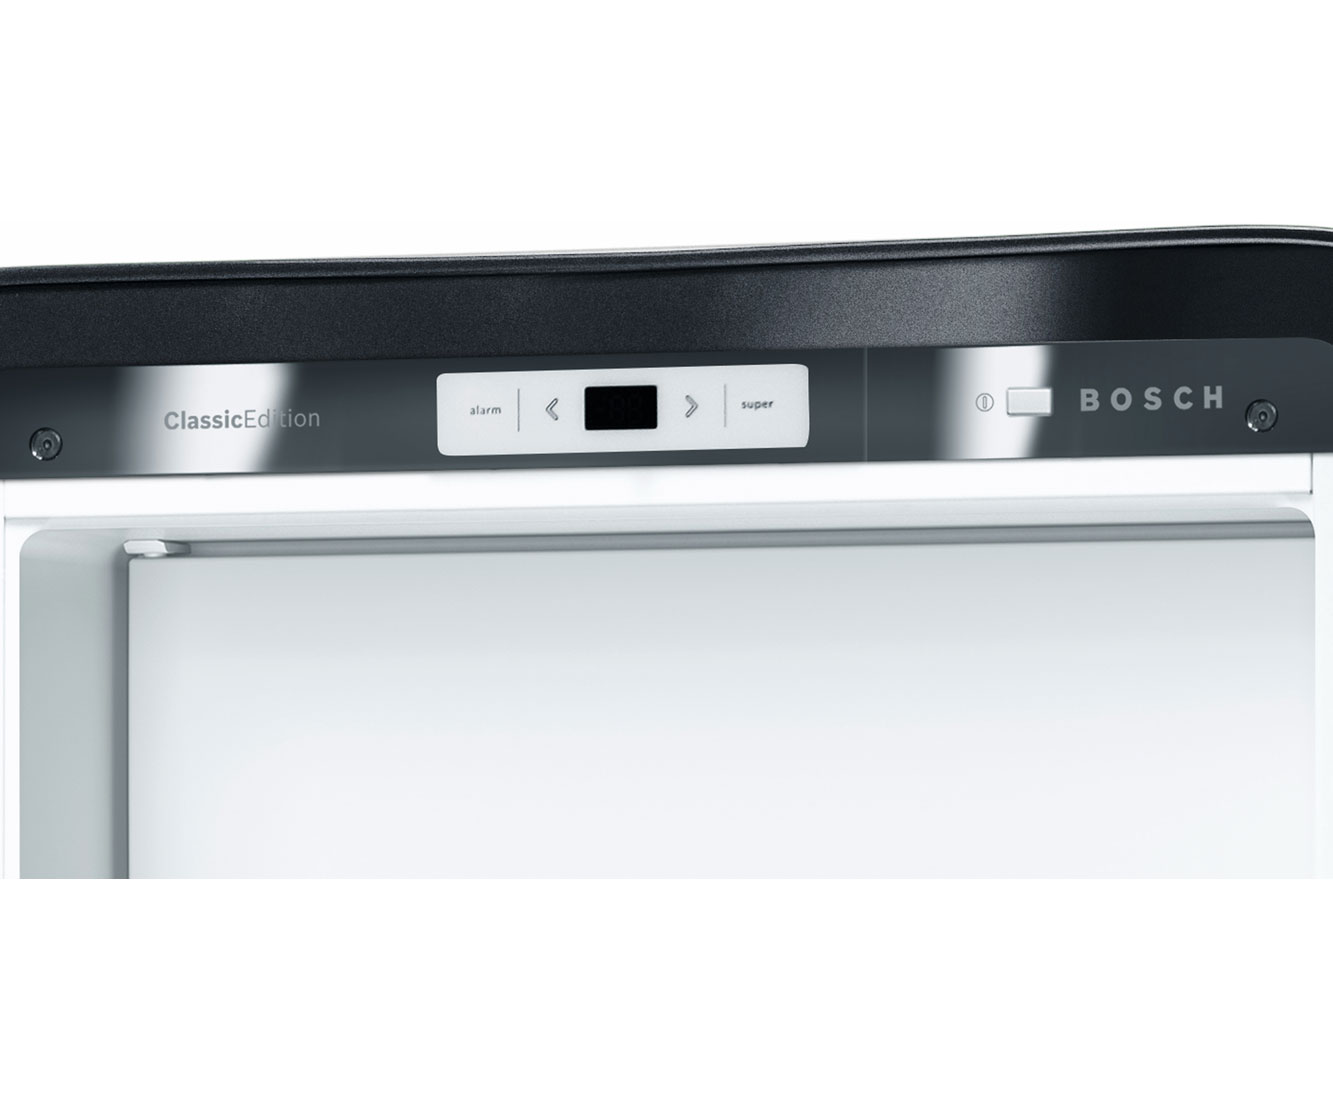 Bosch Kühlschrank Classic Edition Gebraucht : Unglaublich fabelhafte dekoration bosch kühlschrank classic